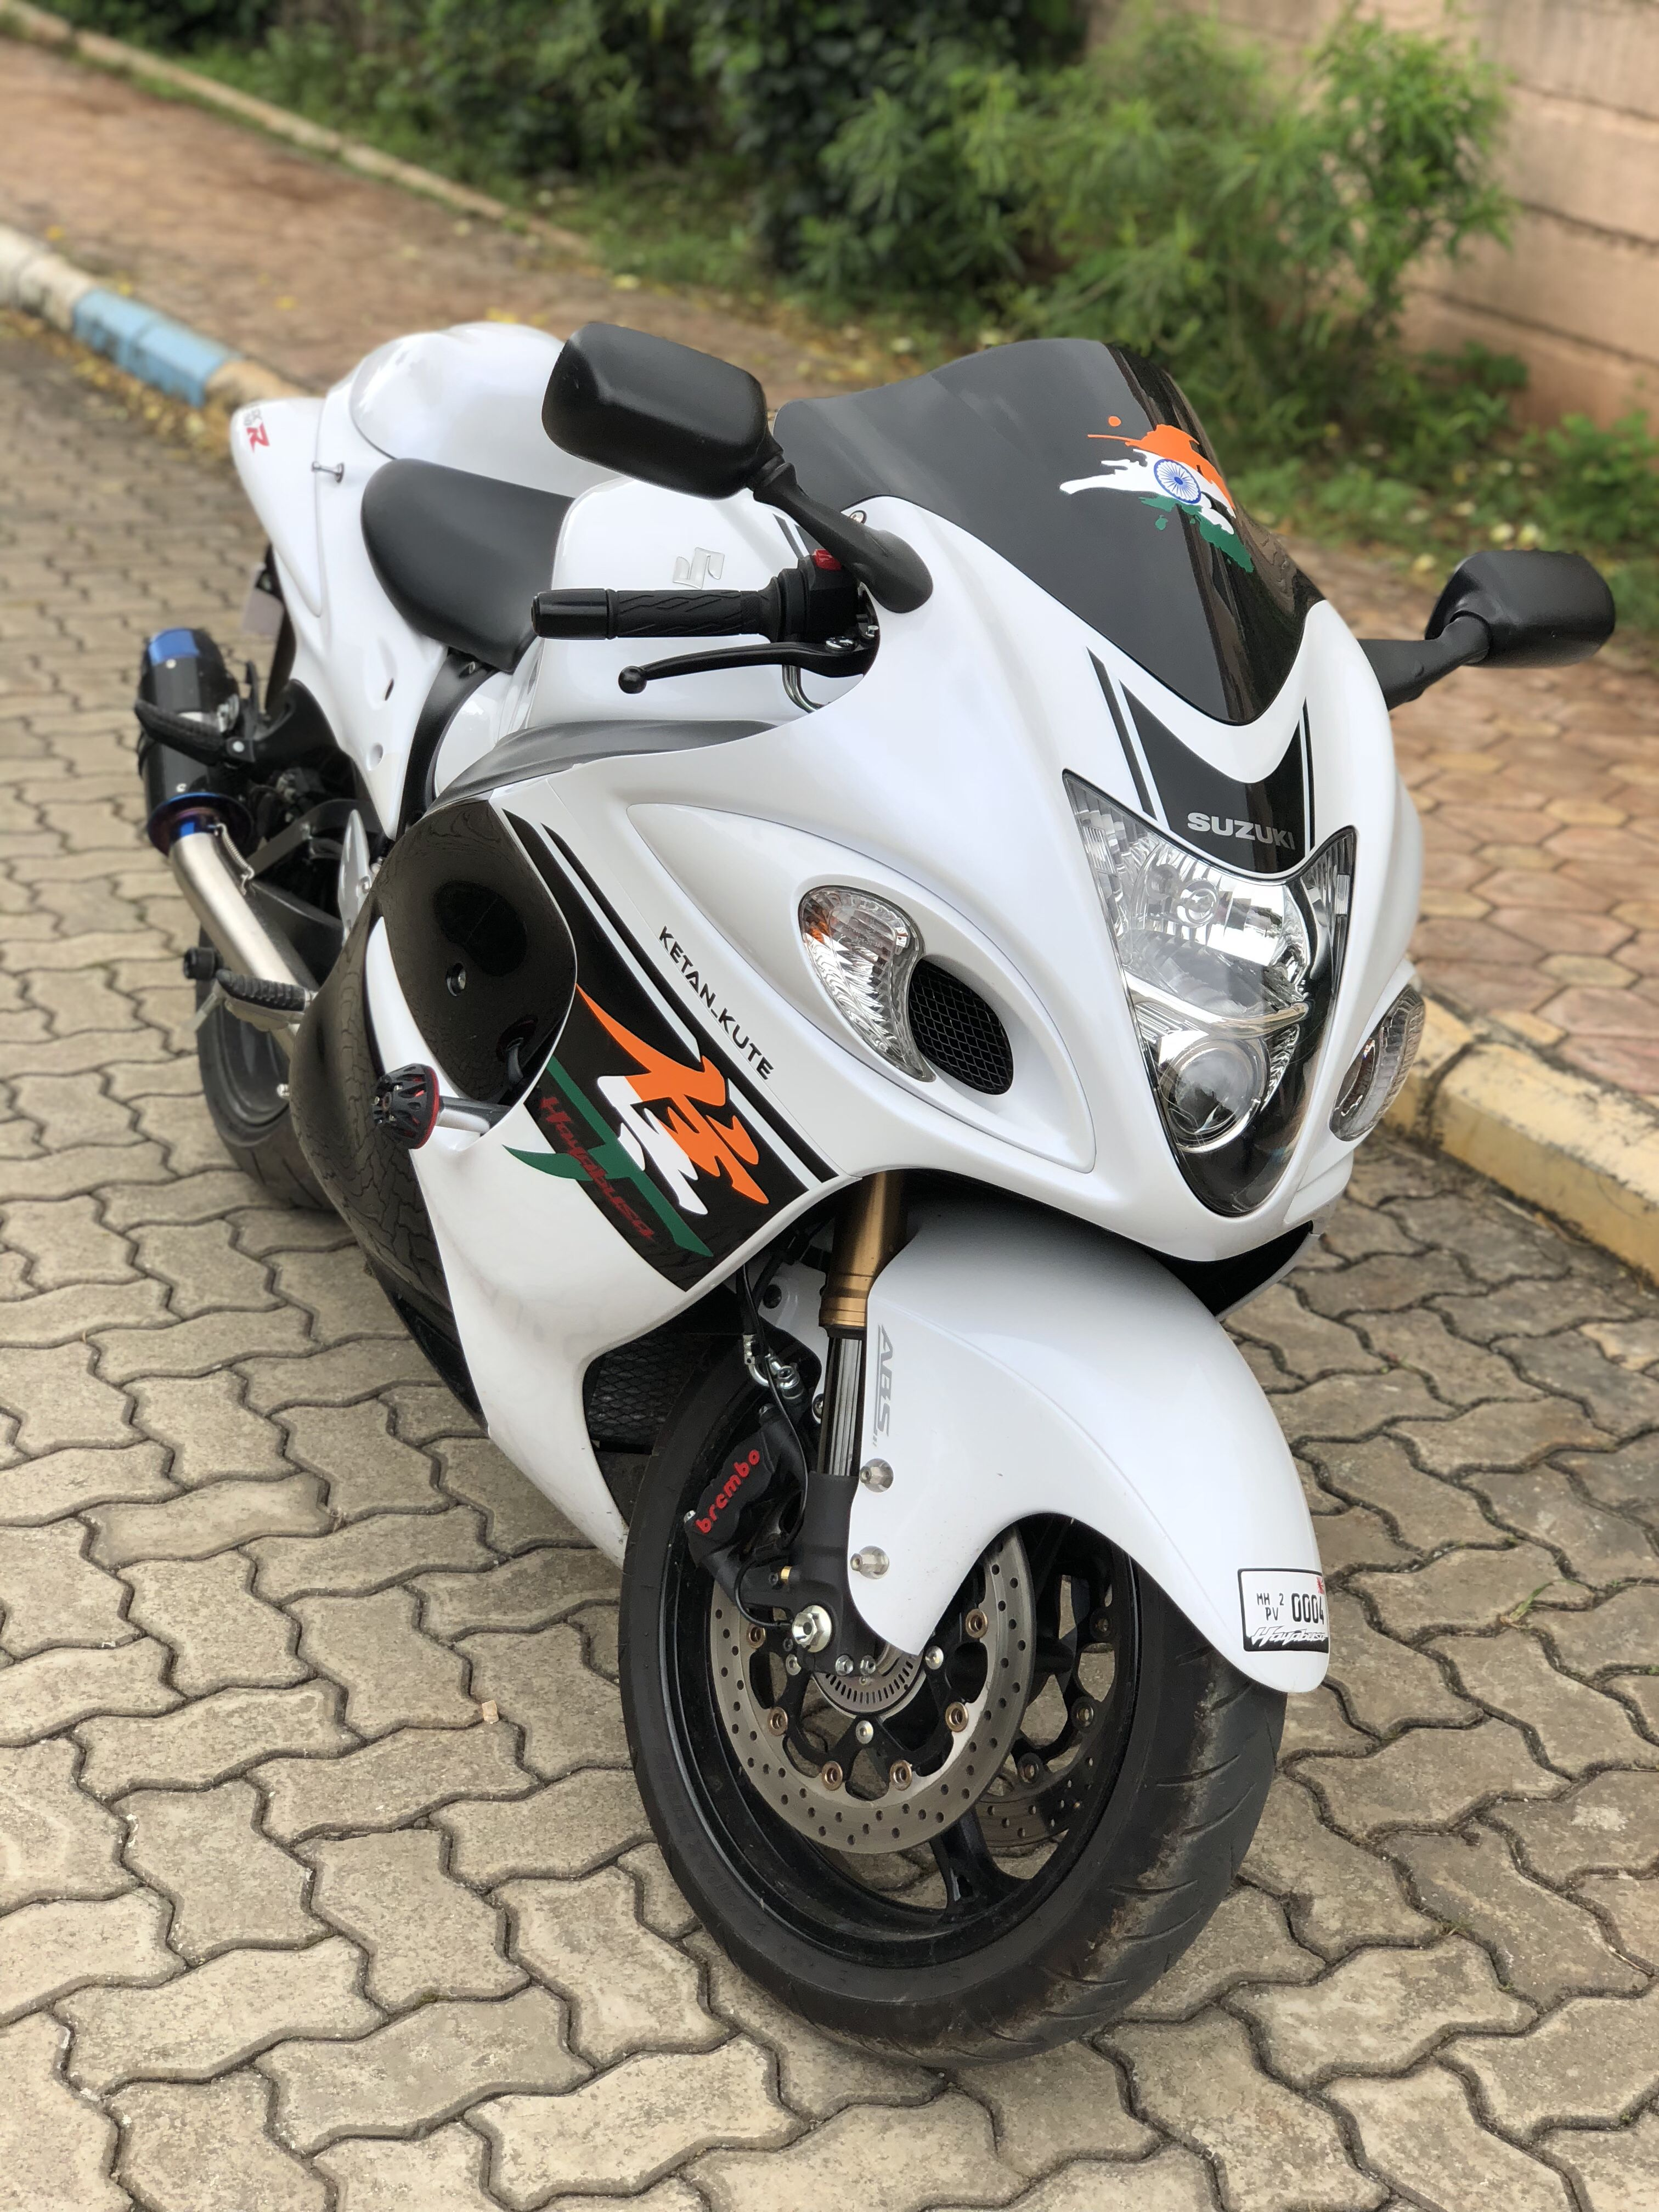 Suzuki Hayabusa sports bike Hayabusa motorcycle, Suzuki